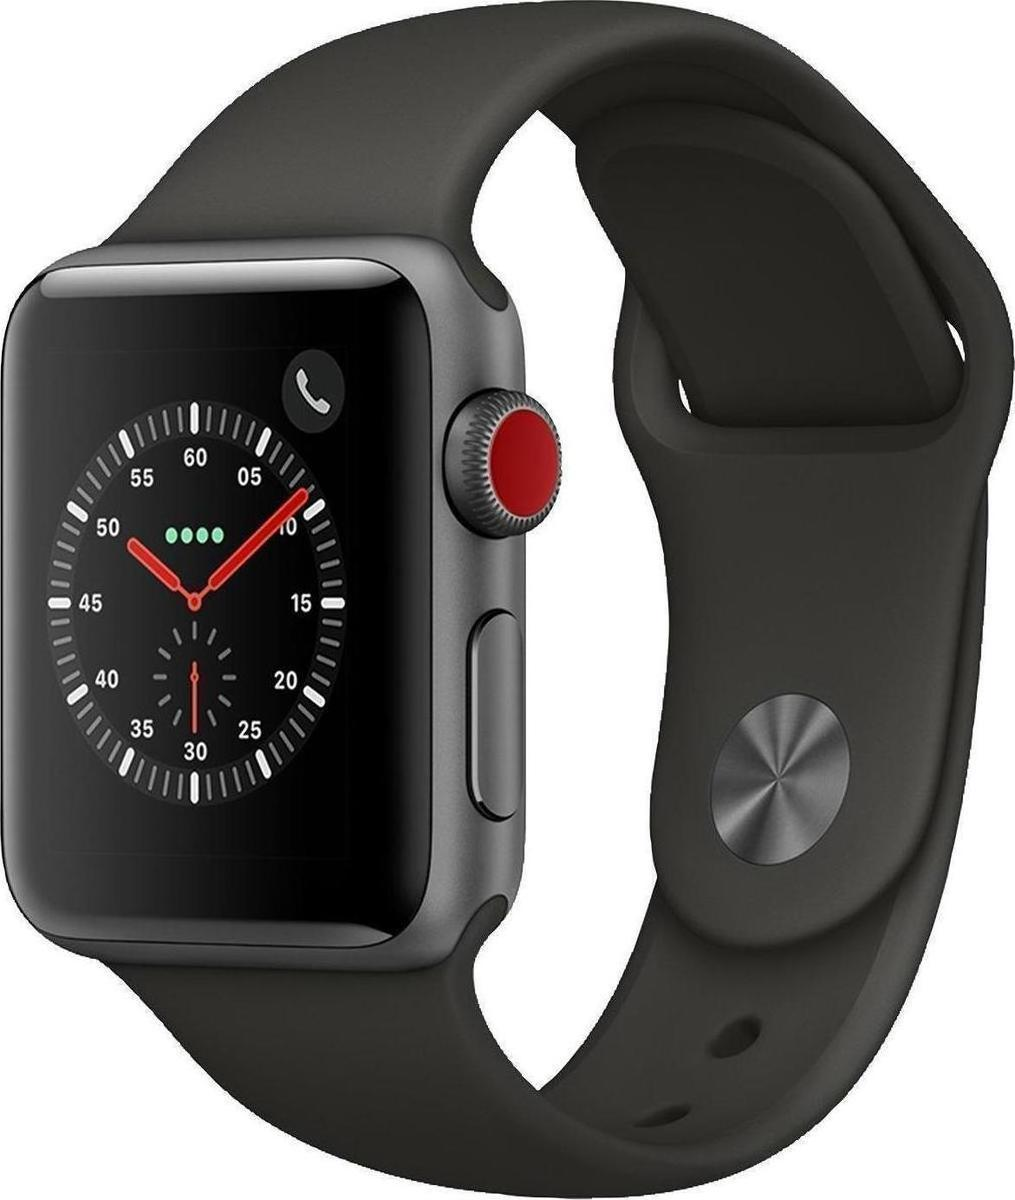 Apple Watch Series 3 Cellular 38mm Grey Aluminium Black Sport Band MTGP2 Πληρωμή έως 24 δόσεις